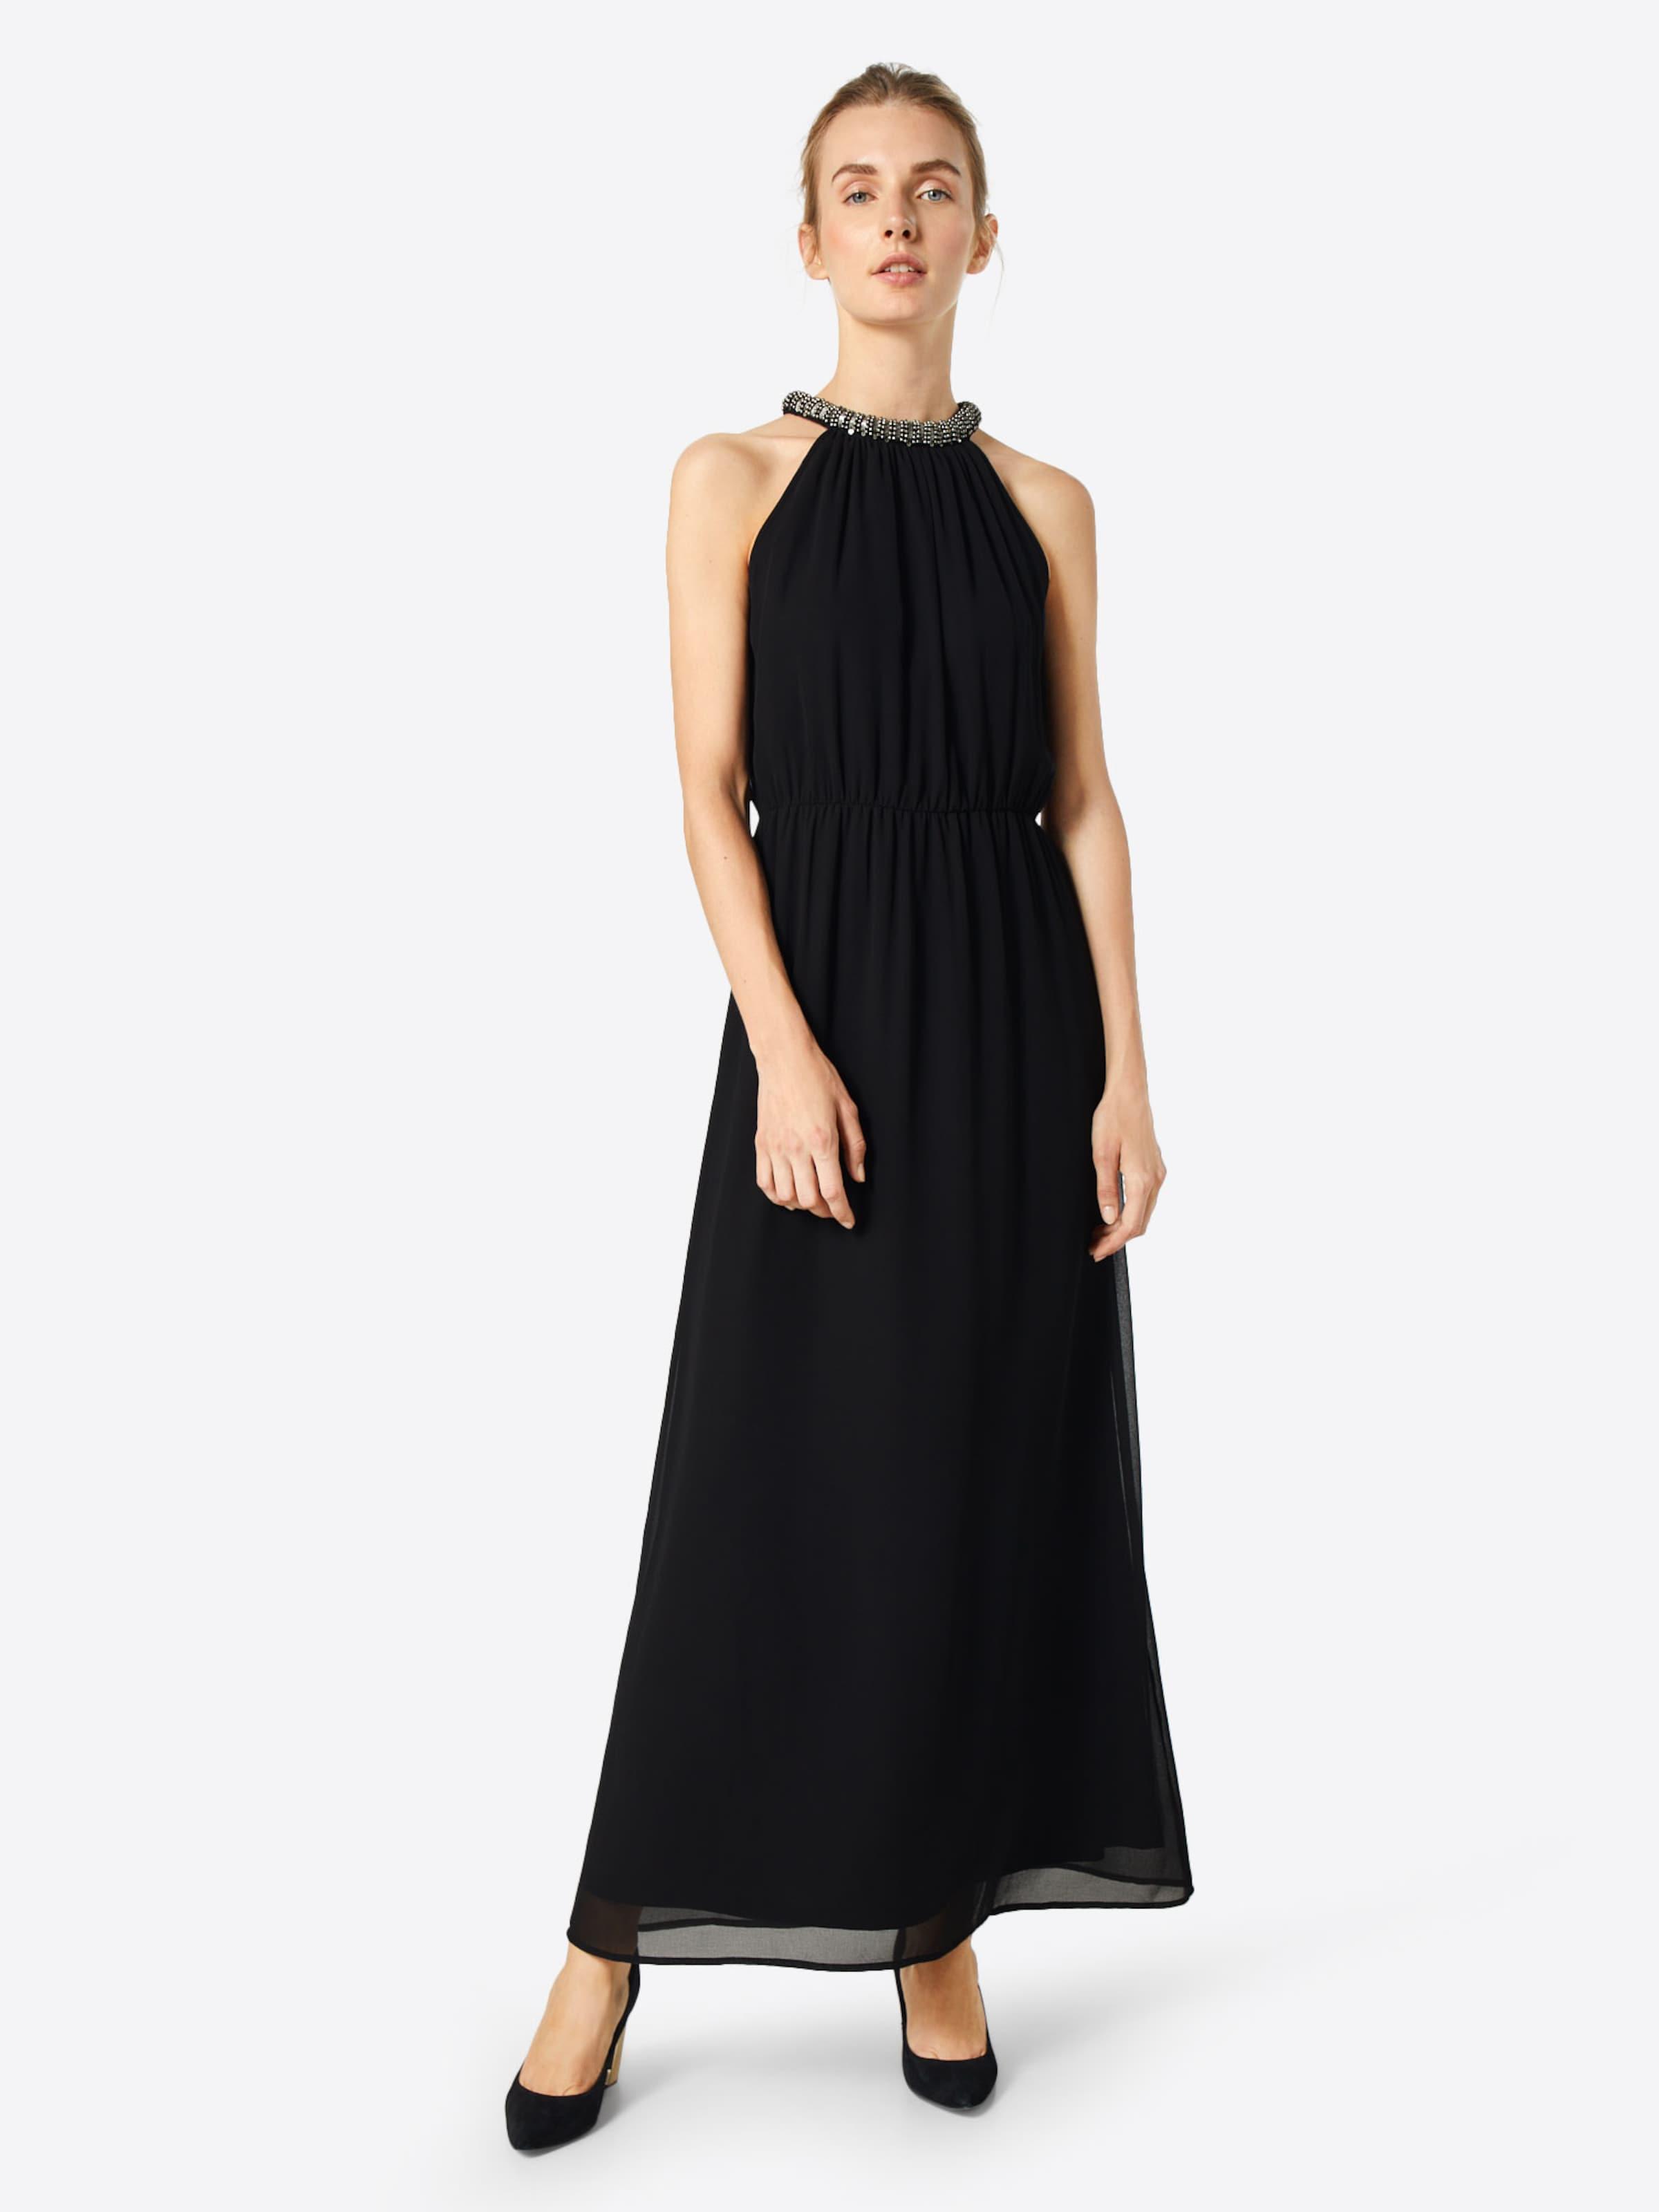 Schwarz Kleid In About 'elisa' You qUMpSLGjzV